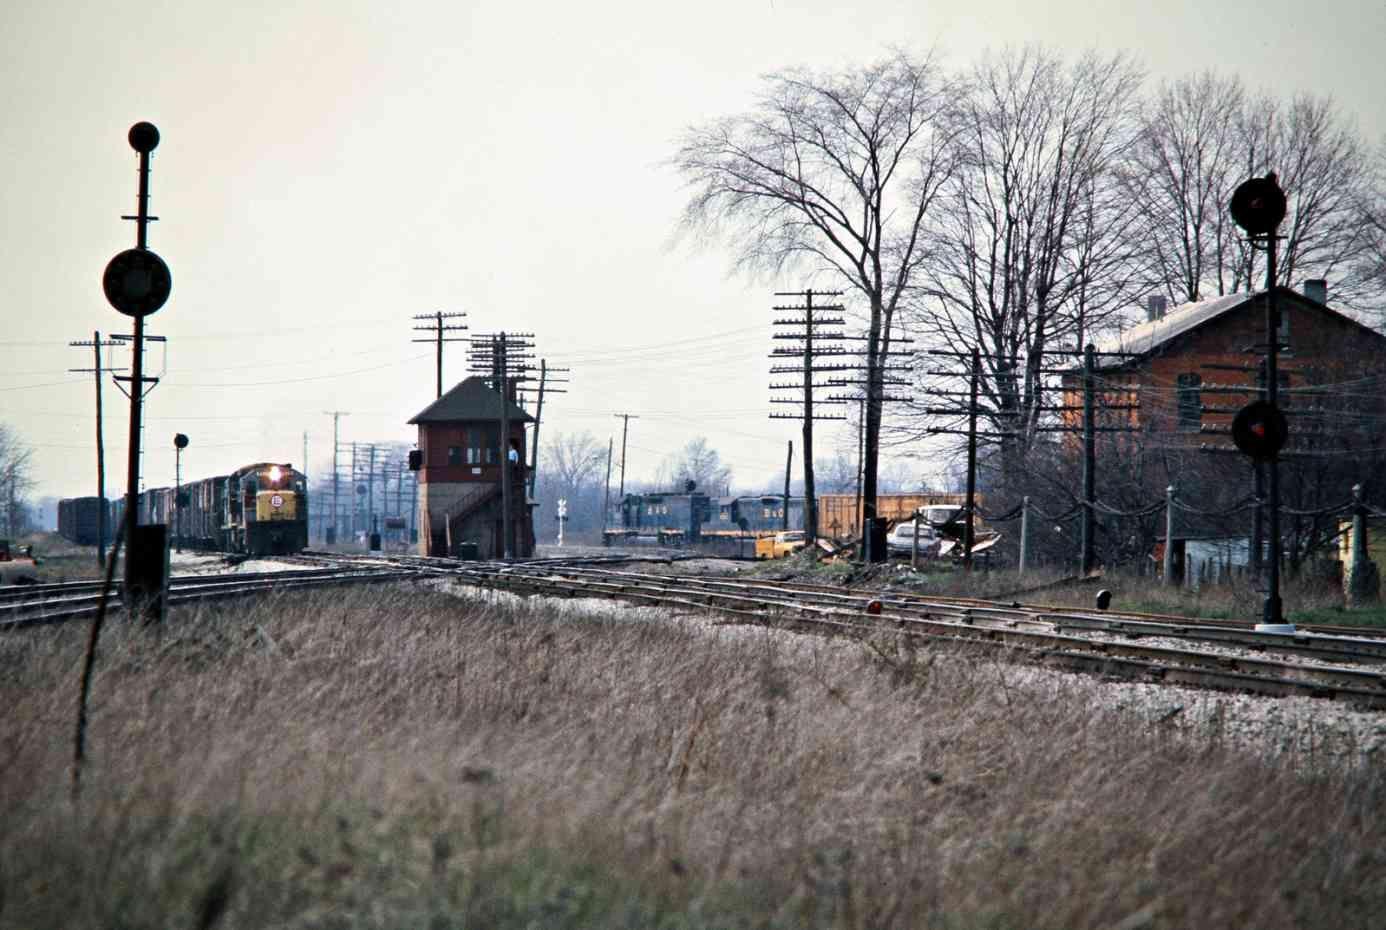 Crbo sterling ohio 1976 railroad photography